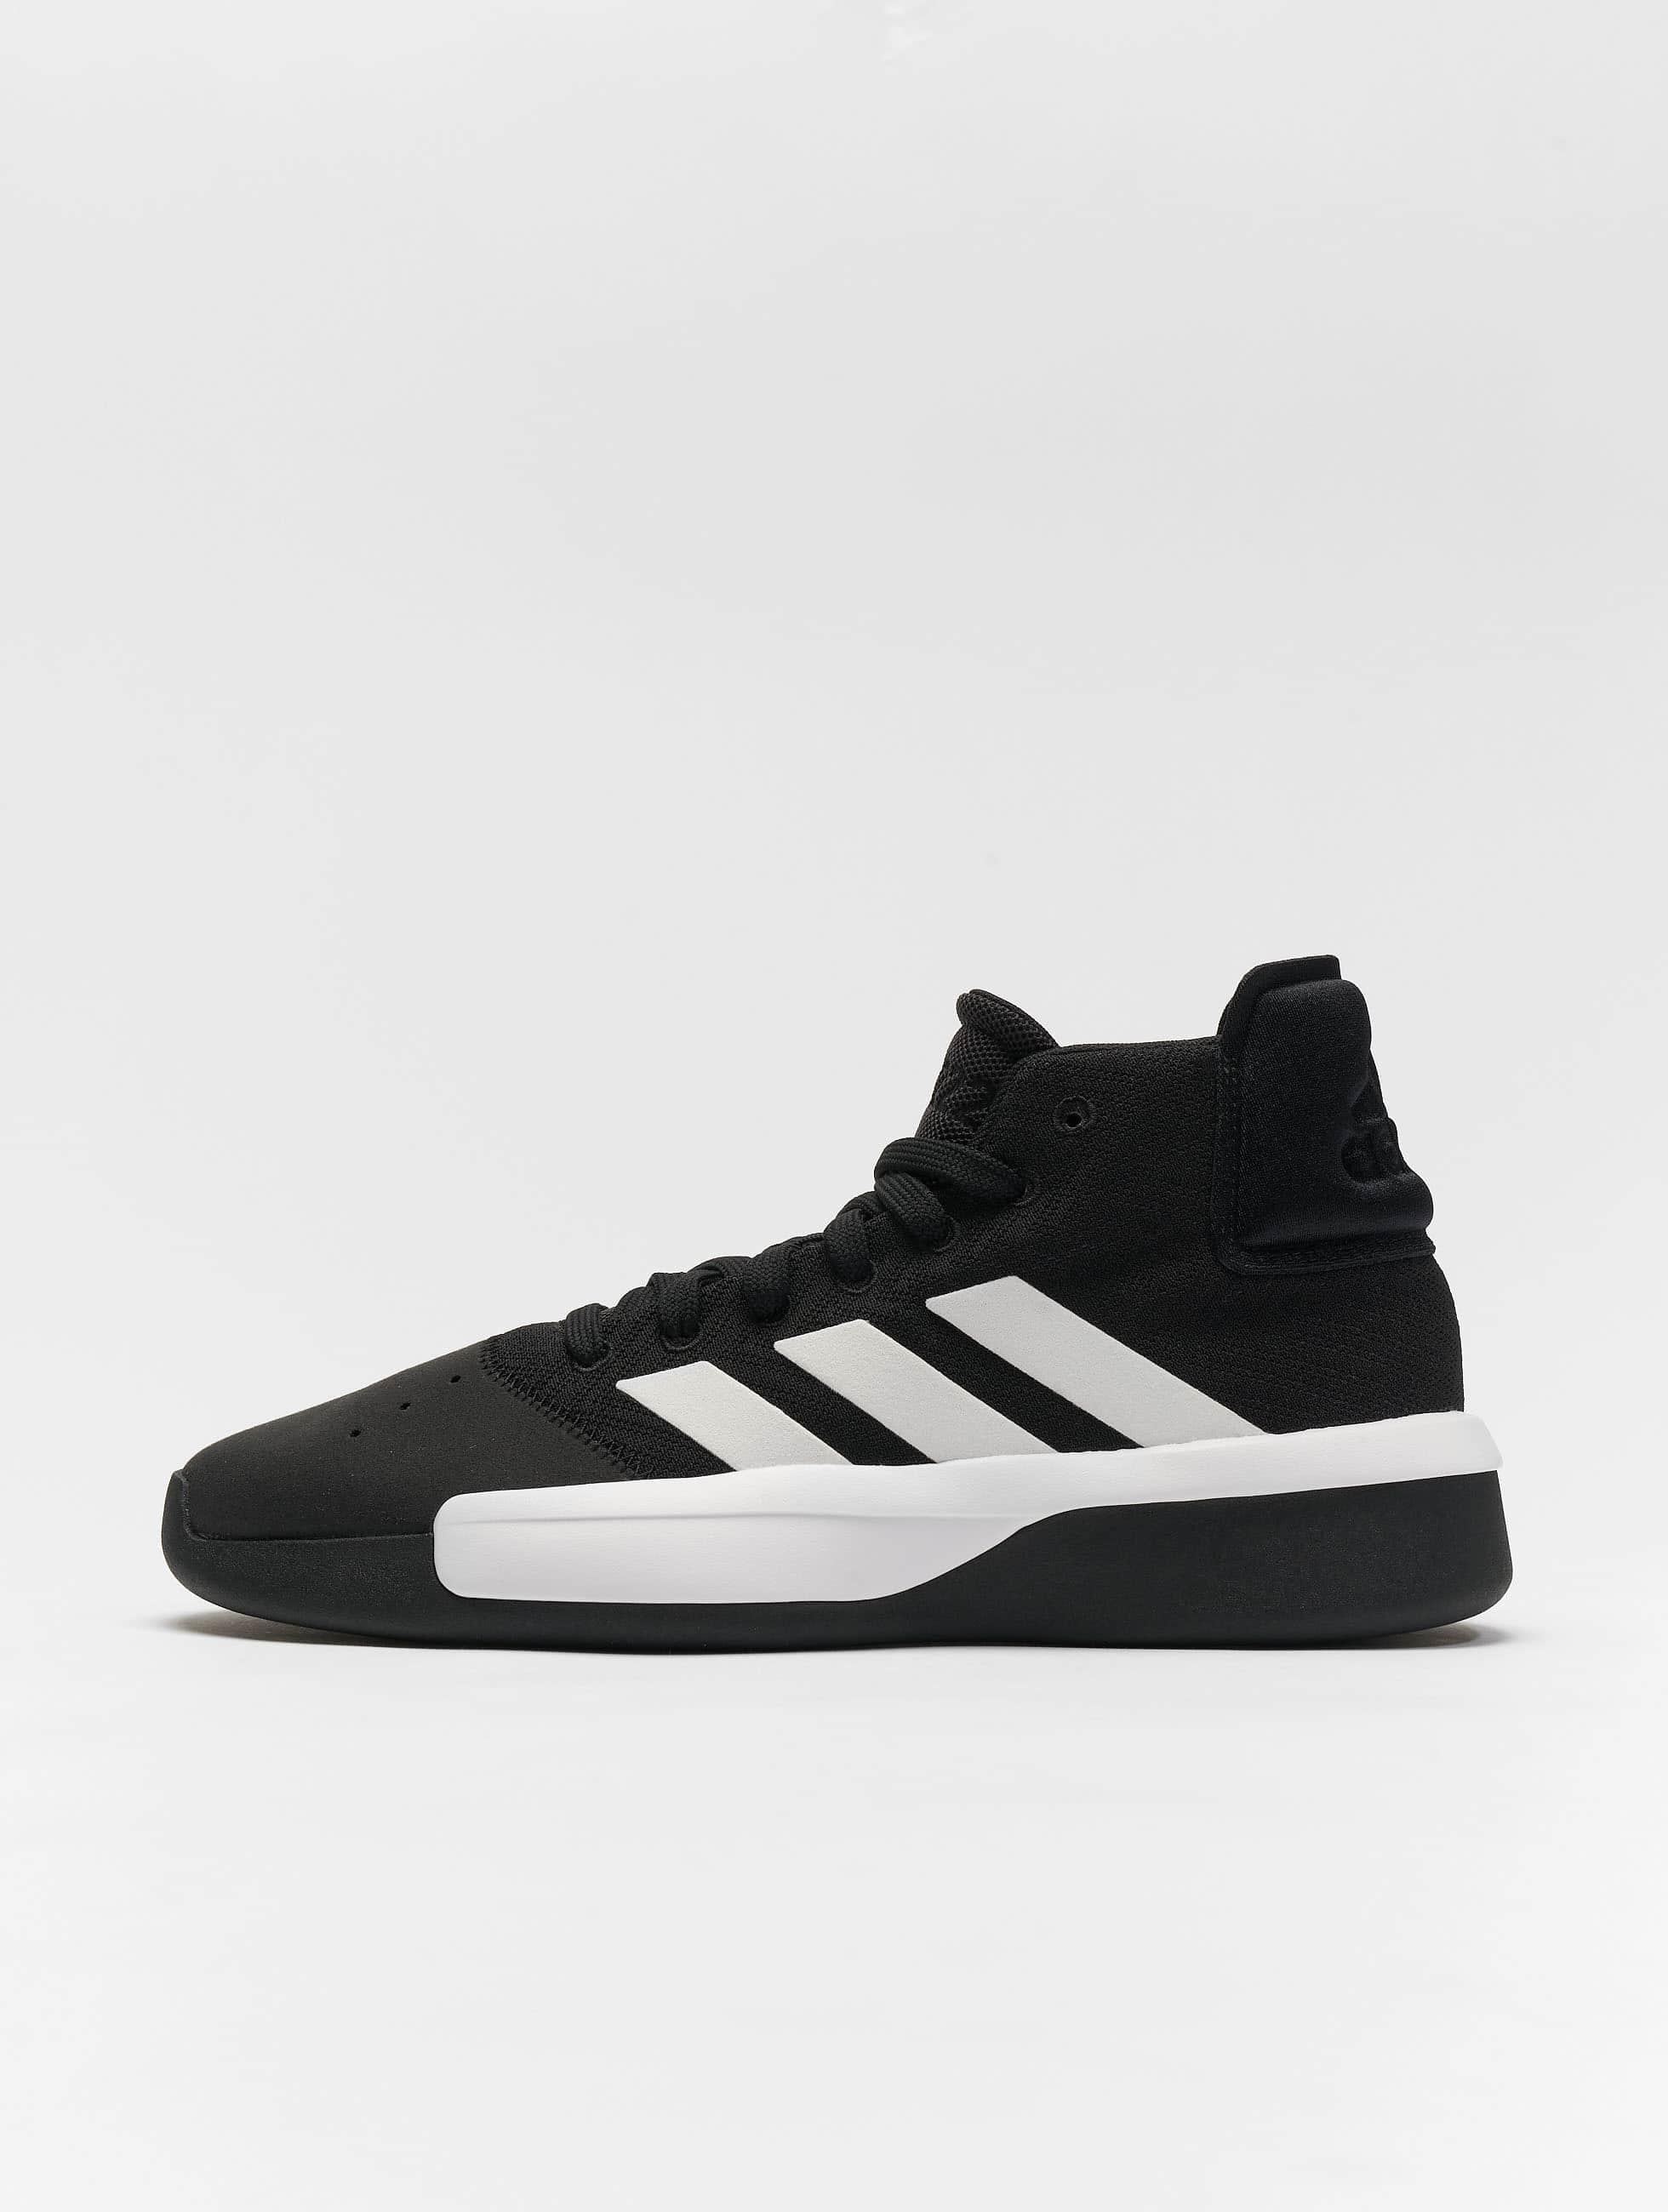 Basketball Blackftw Pro Whitegrey Adidas Core Adversary Shoes Four n08XwOPNkZ